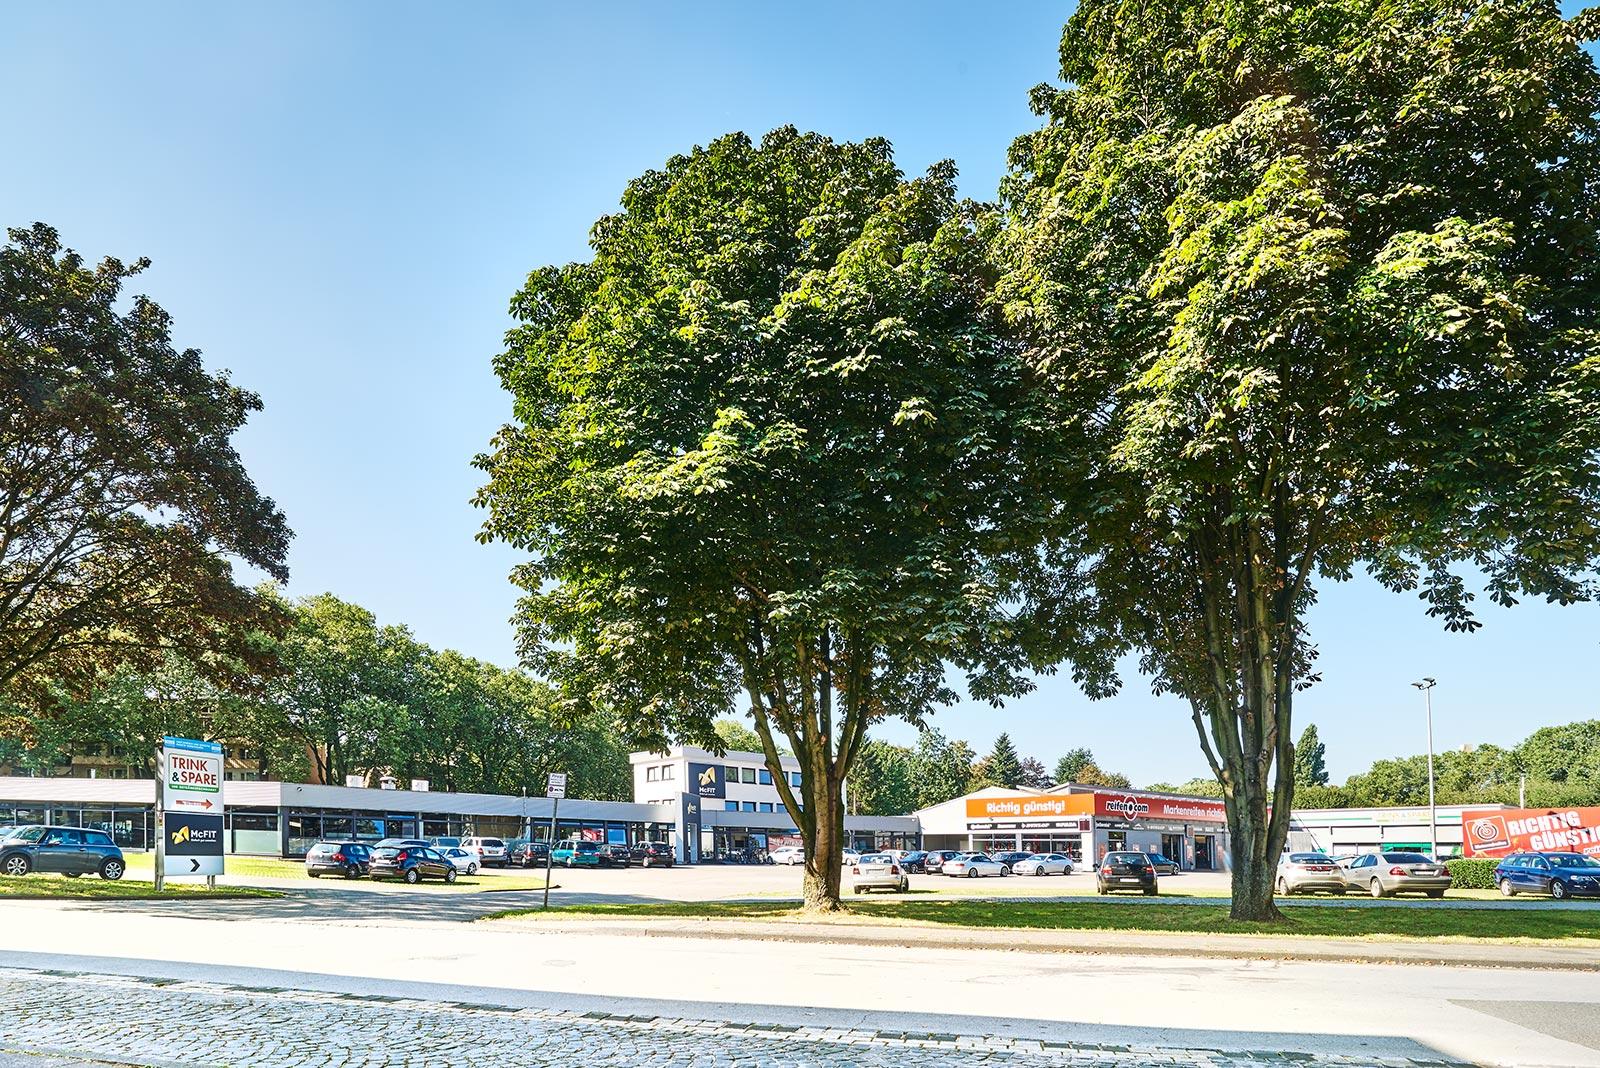 Immobilie in Duisburg (Hamborn): Fitnessstudio, Getränkemarkt, Werkstatt